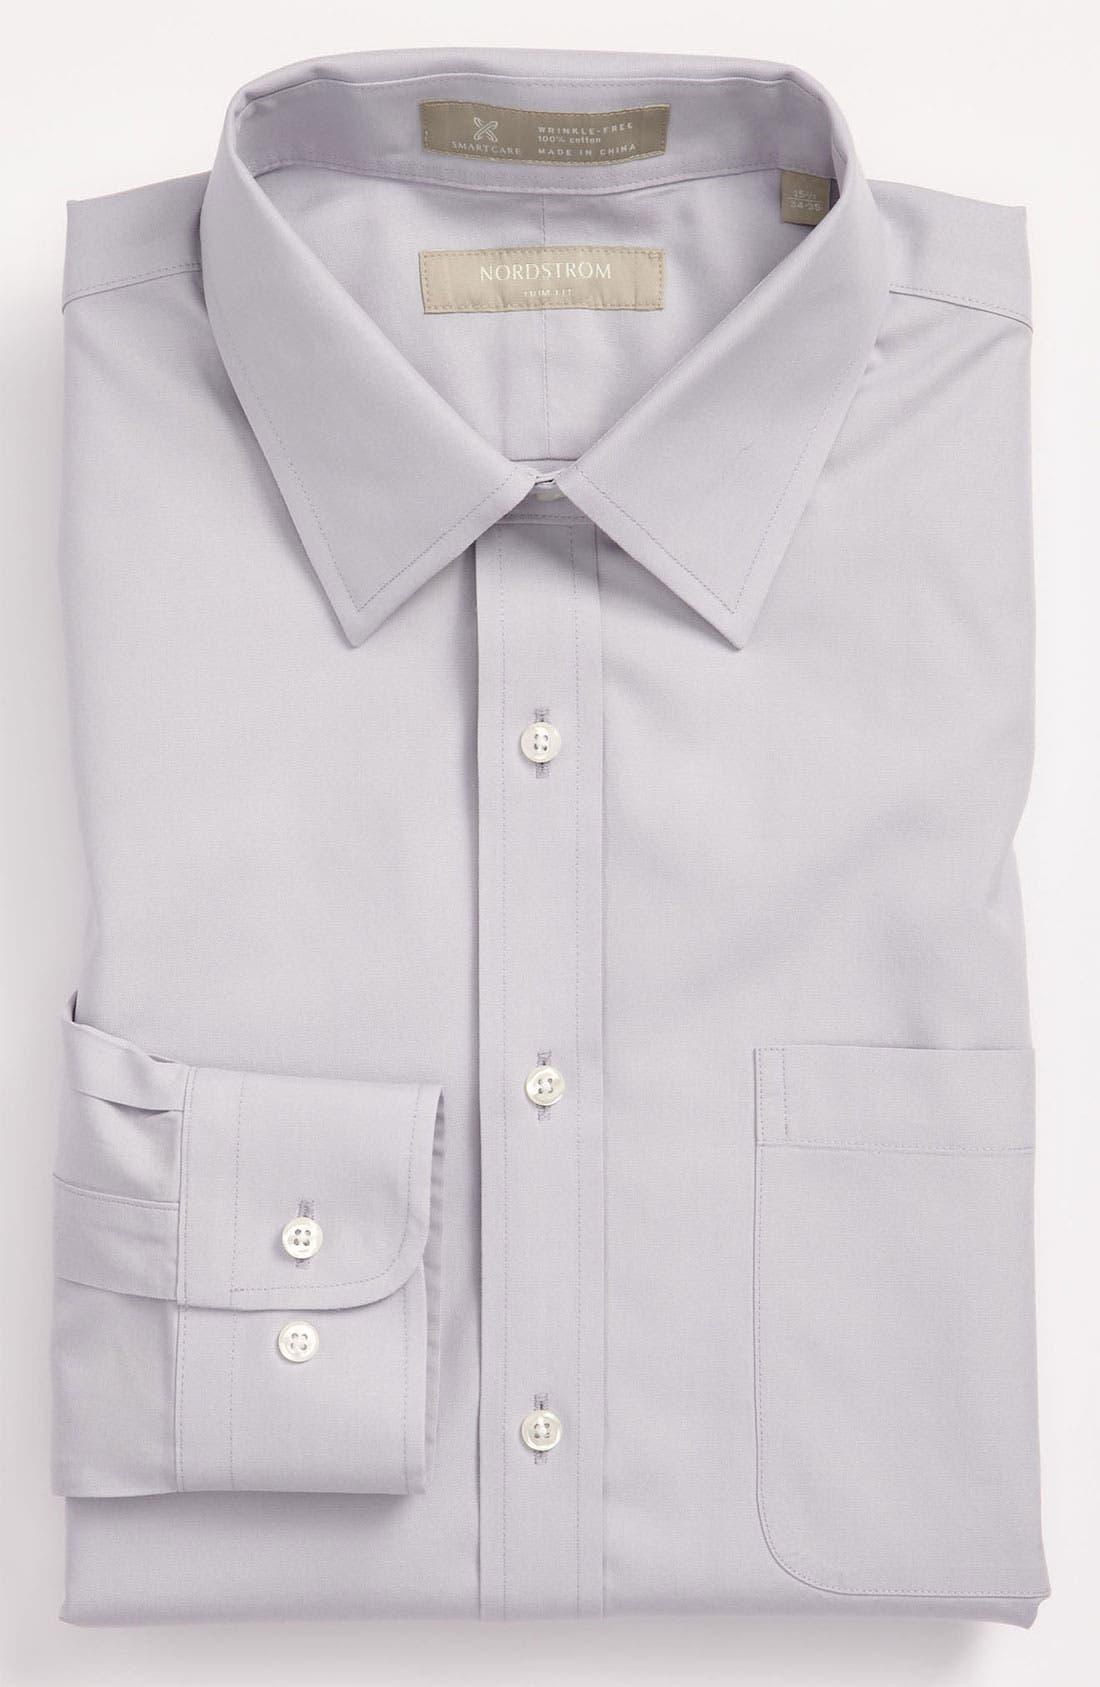 Main Image - Nordstrom Men's Shop Smartcare™ Trim Fit Solid Dress Shirt